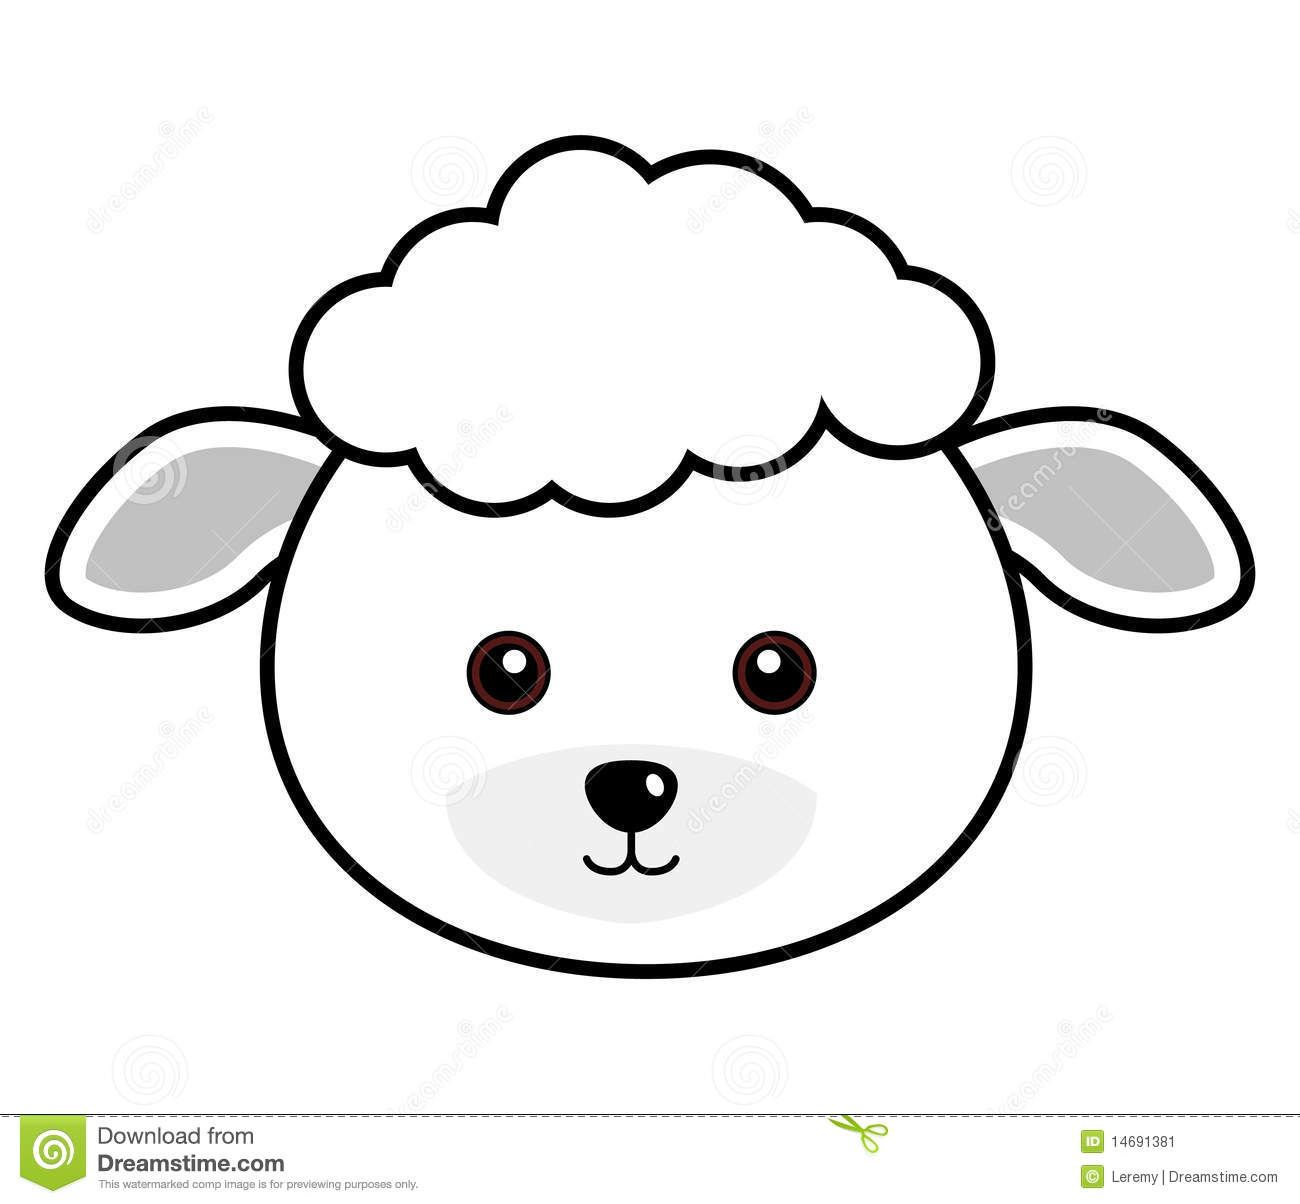 Pin By Martina Goedhart On Farmyard Fun Sheep Face Cute Sheep Sheep Vector